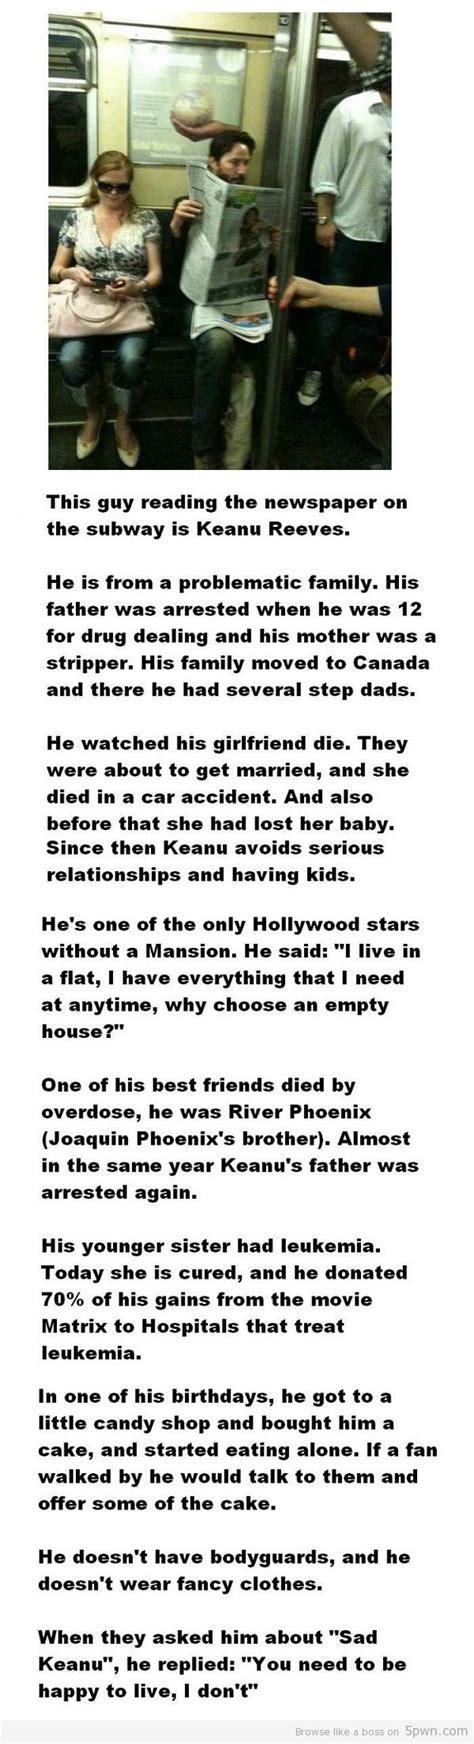 keanu reeves life biography a sad biography of keanu reeves hollywood actor social